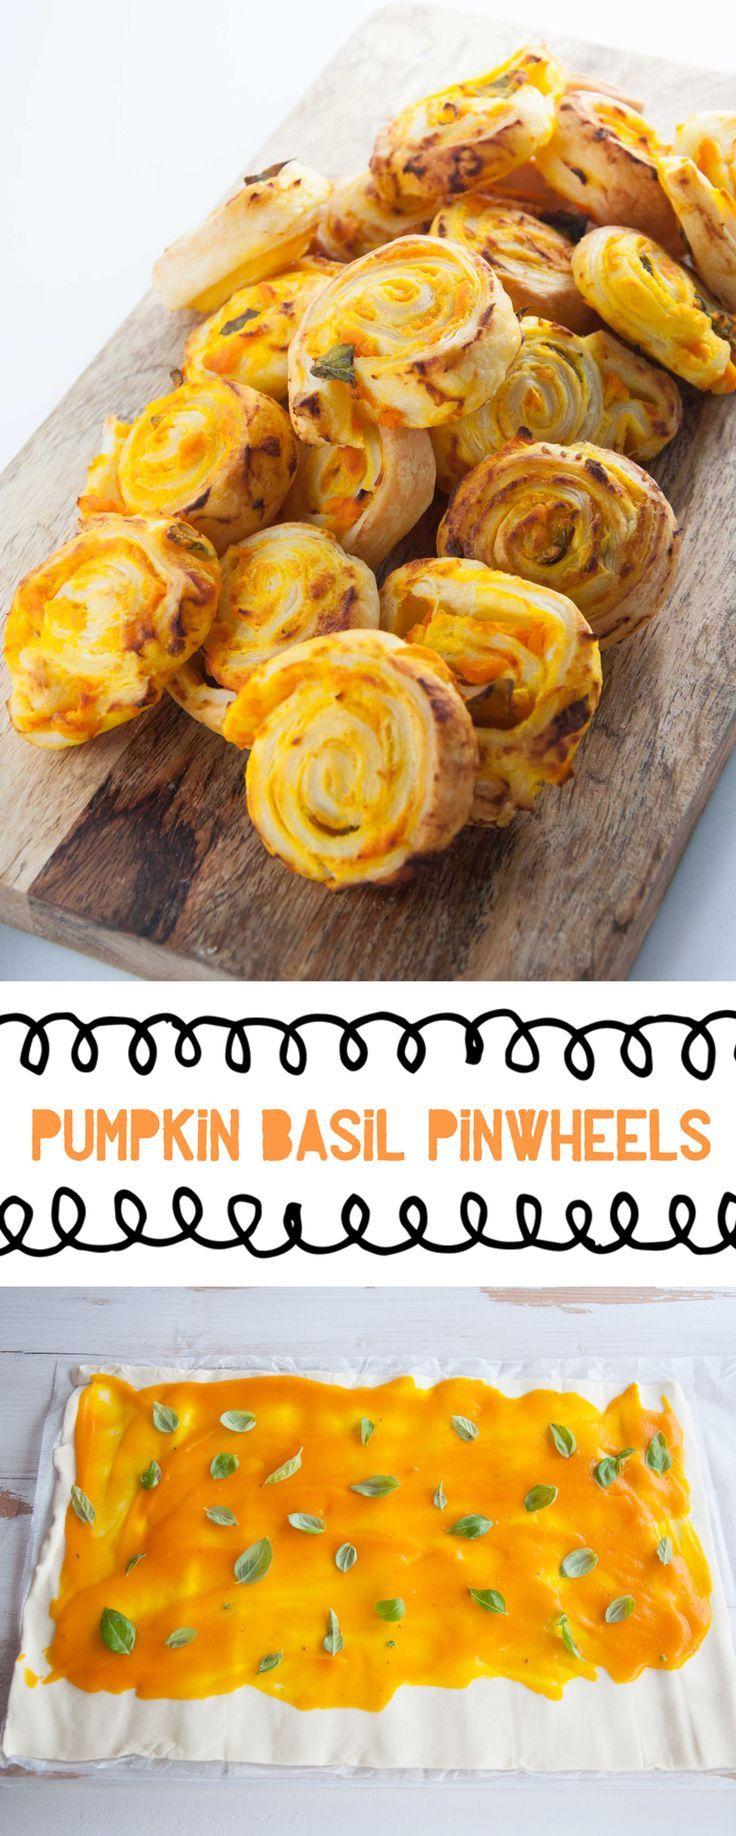 Vegan Pumpkin Basil Pinwheels | http://ElephantasticVegan.com